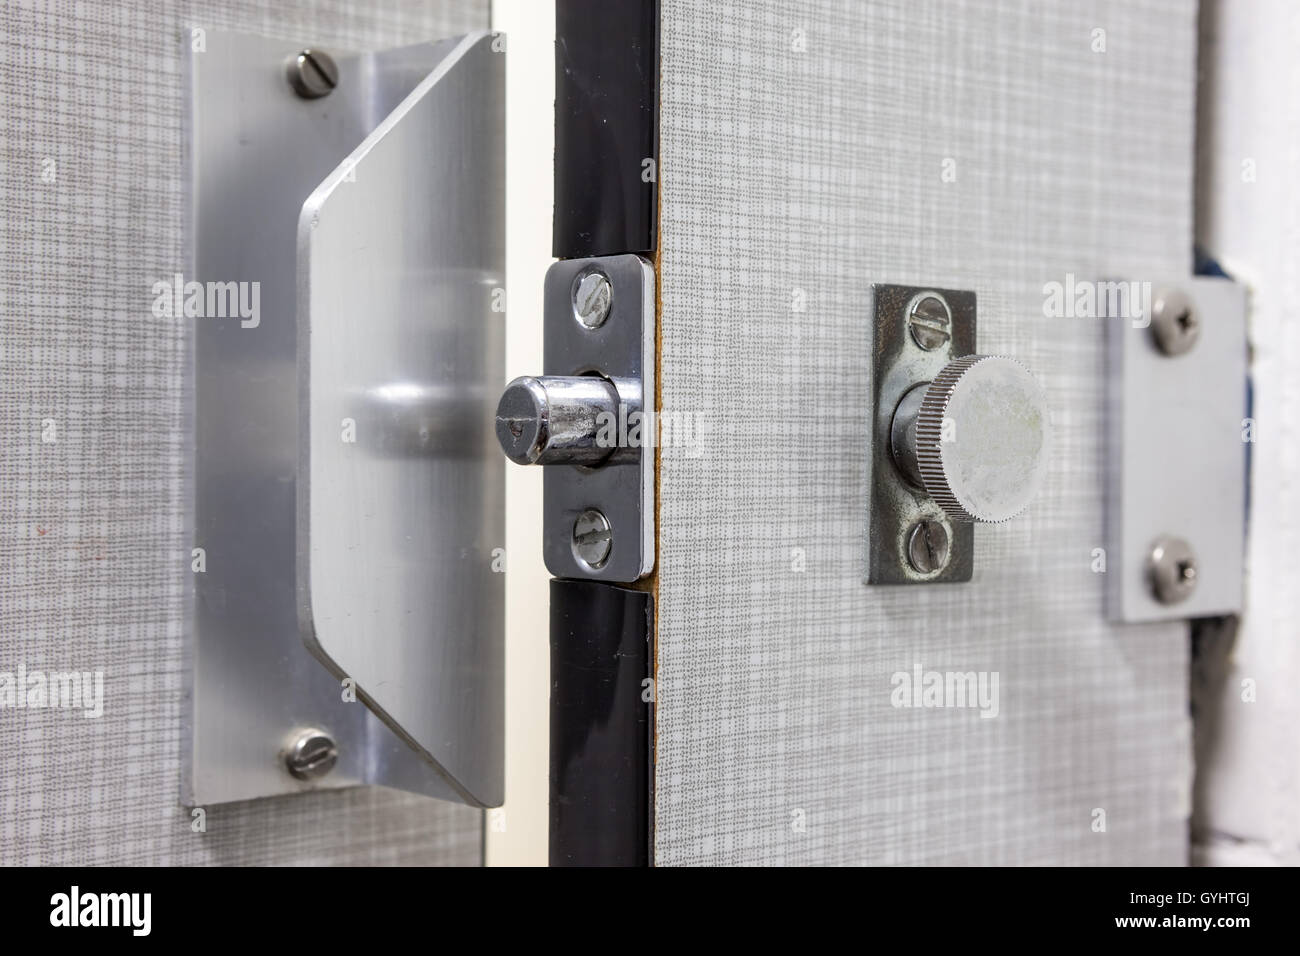 ein Türschloss Metall Toilette im Badezimmer Stockfoto, Bild ...